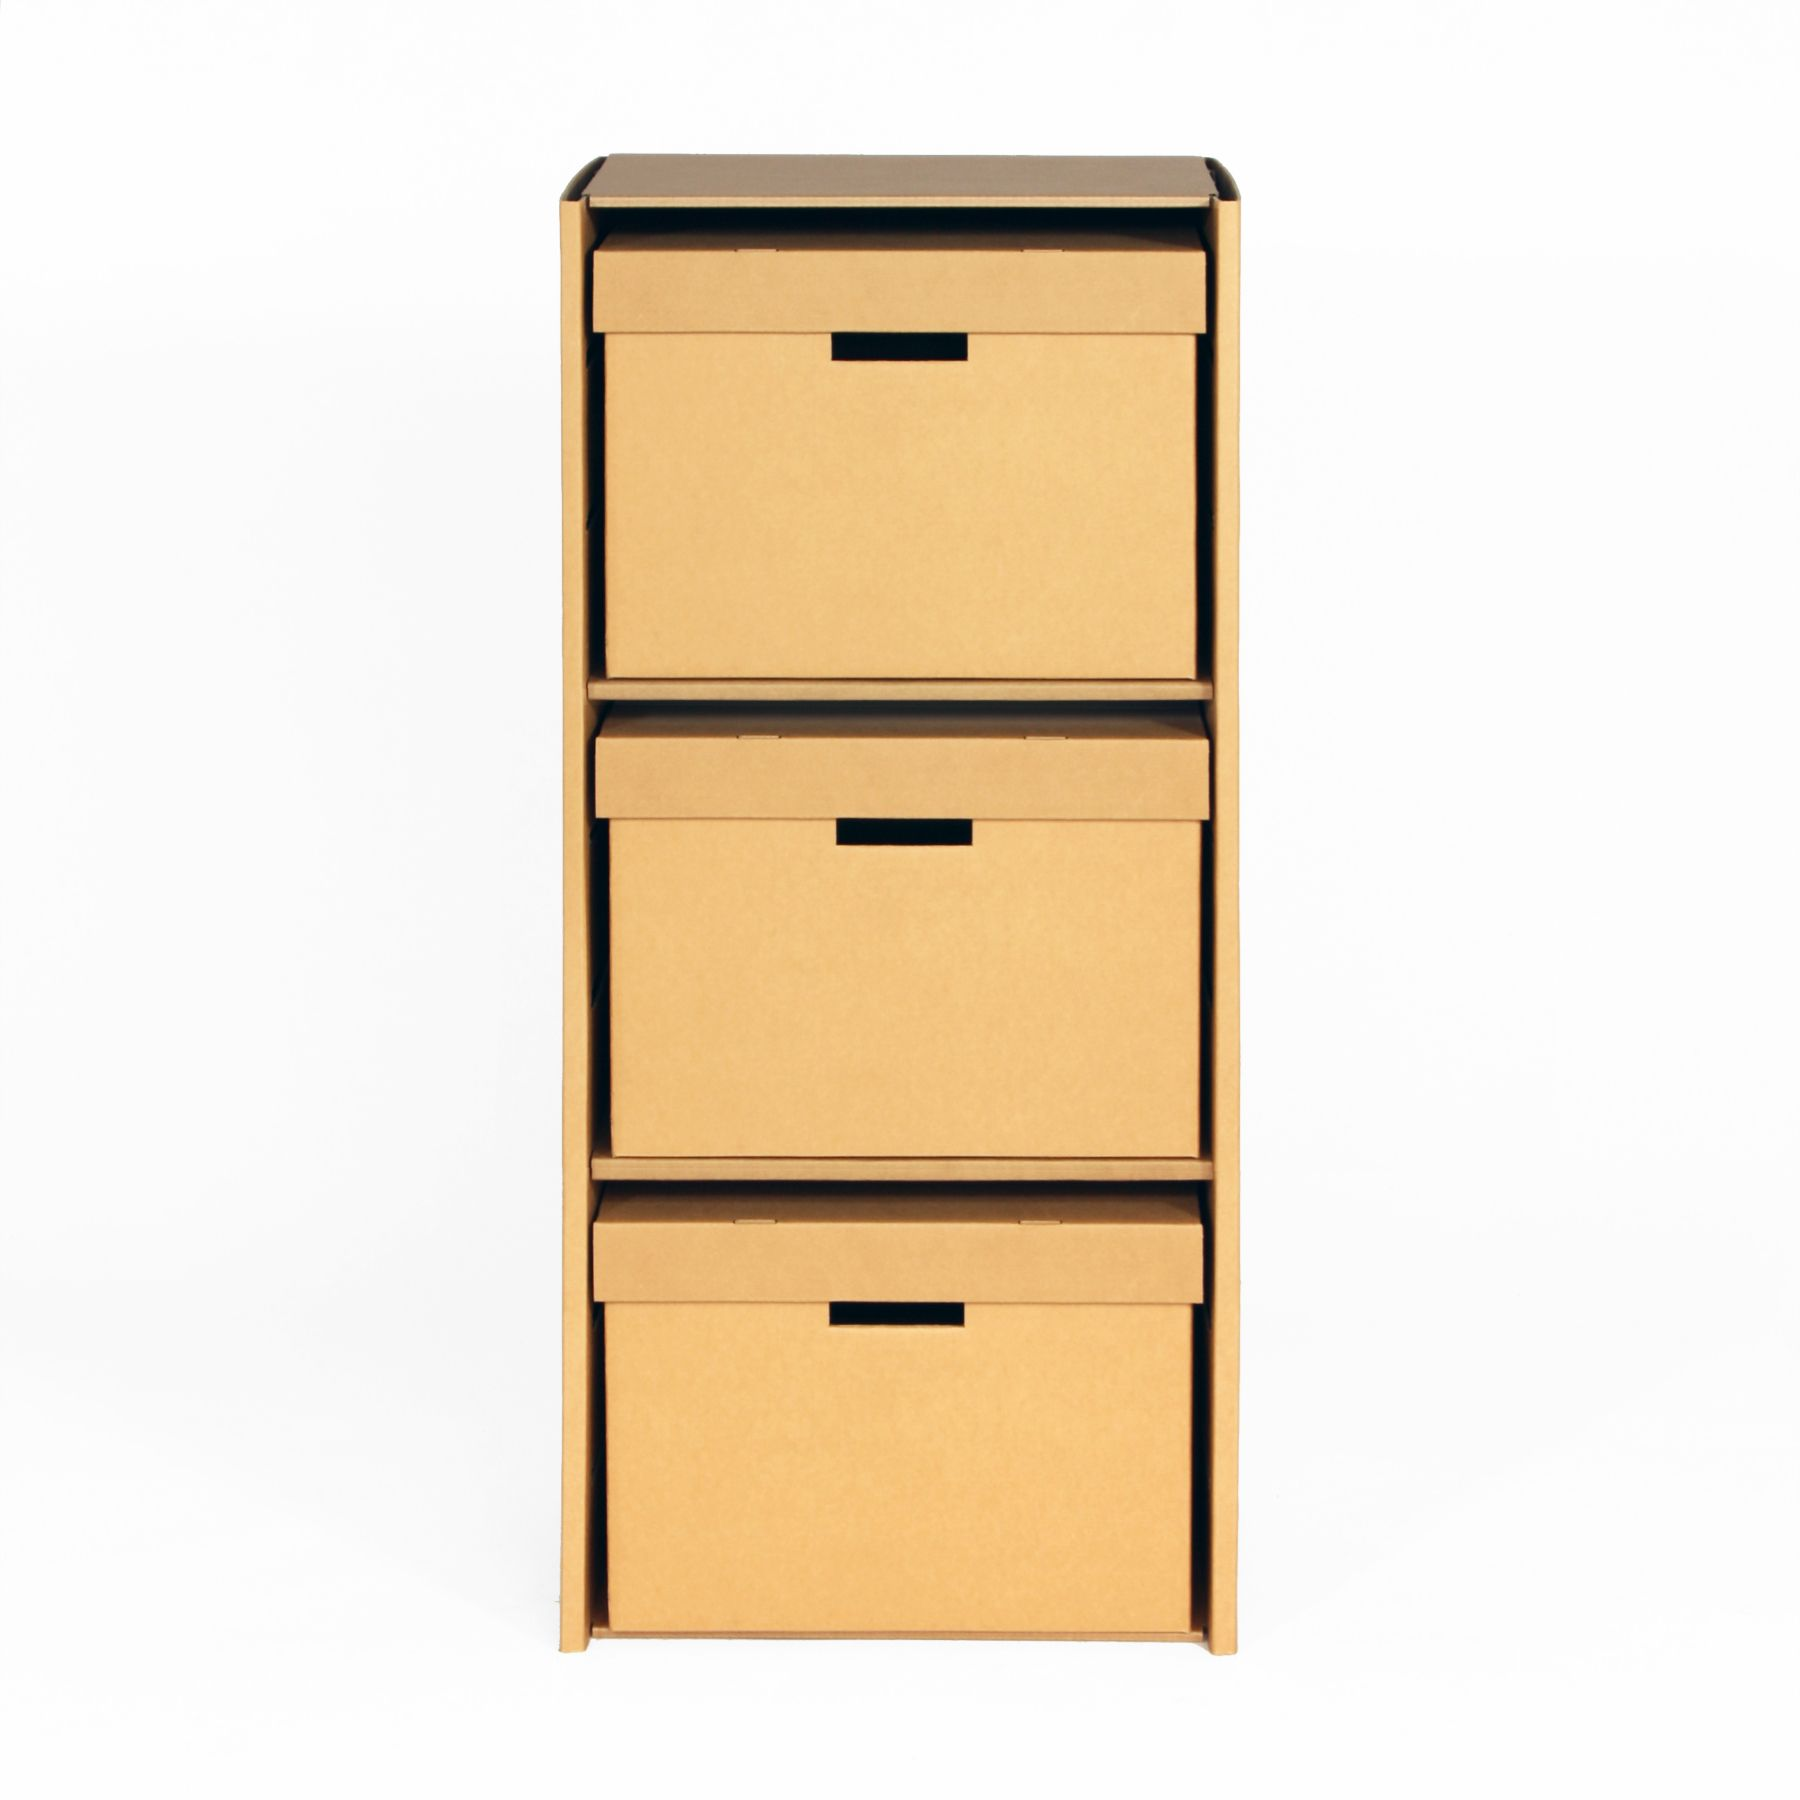 cardboard shelving unit herbert stange design berlin arbeiten pinterest m bel aus pappe. Black Bedroom Furniture Sets. Home Design Ideas